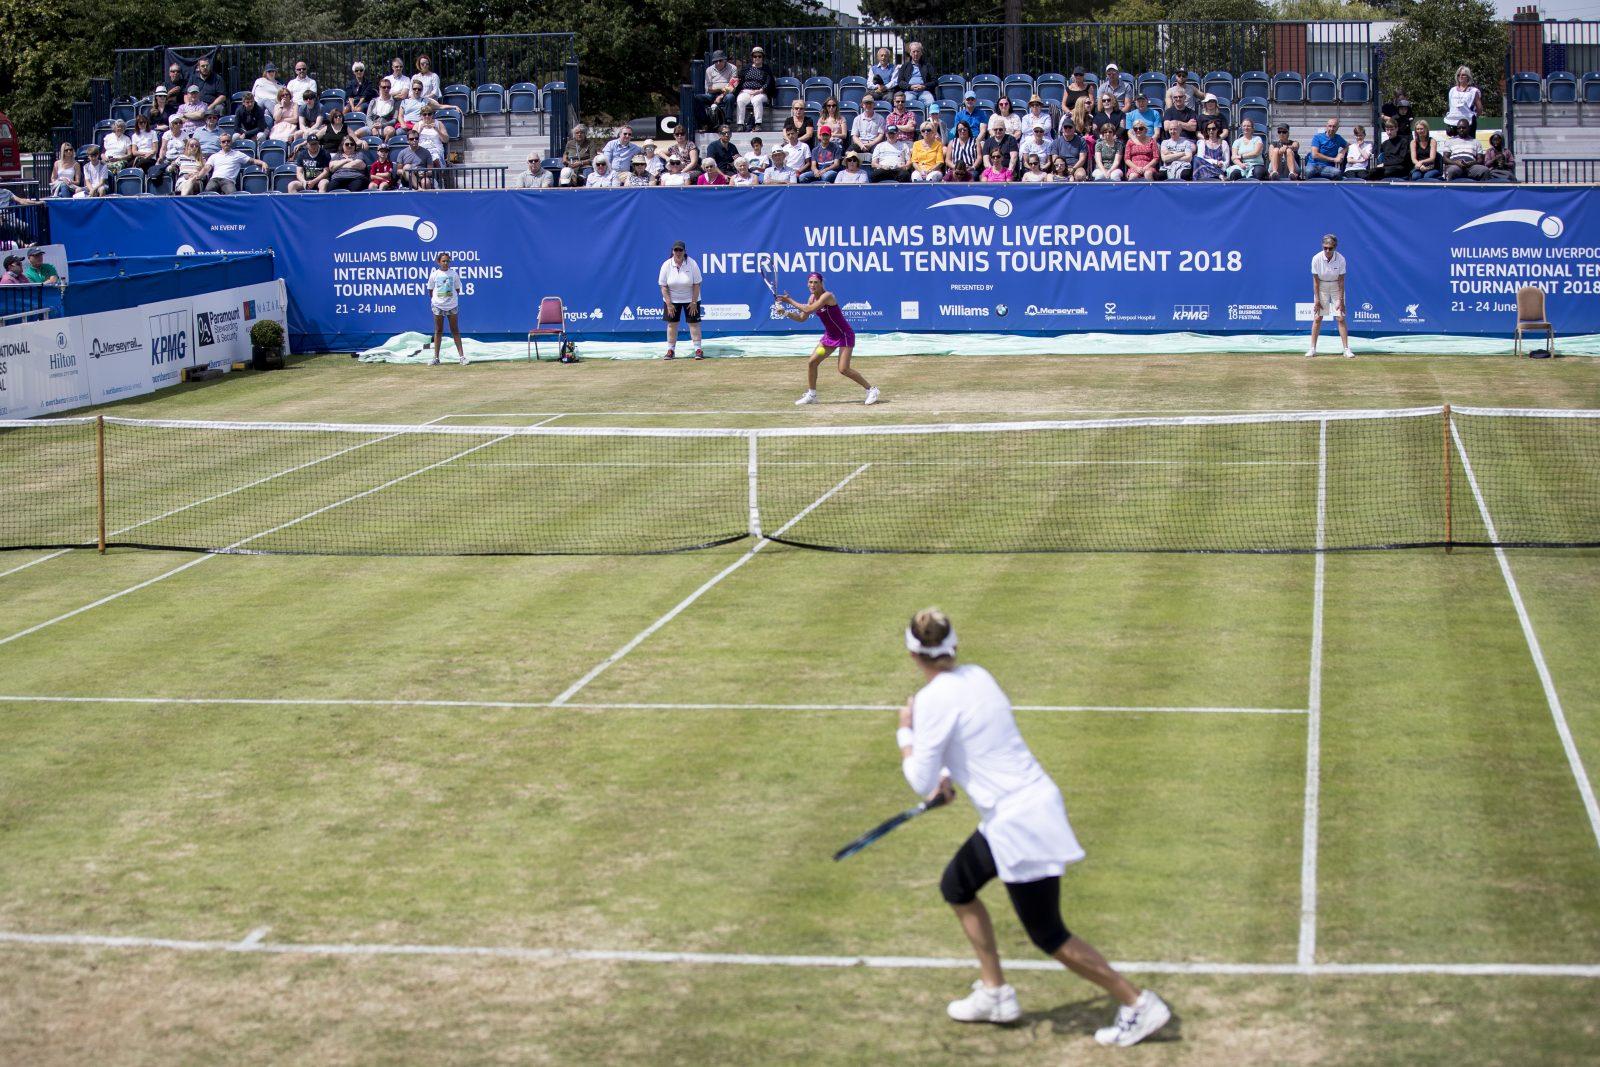 P180623-009-Liverpool_Tennis_D3-1600×1067